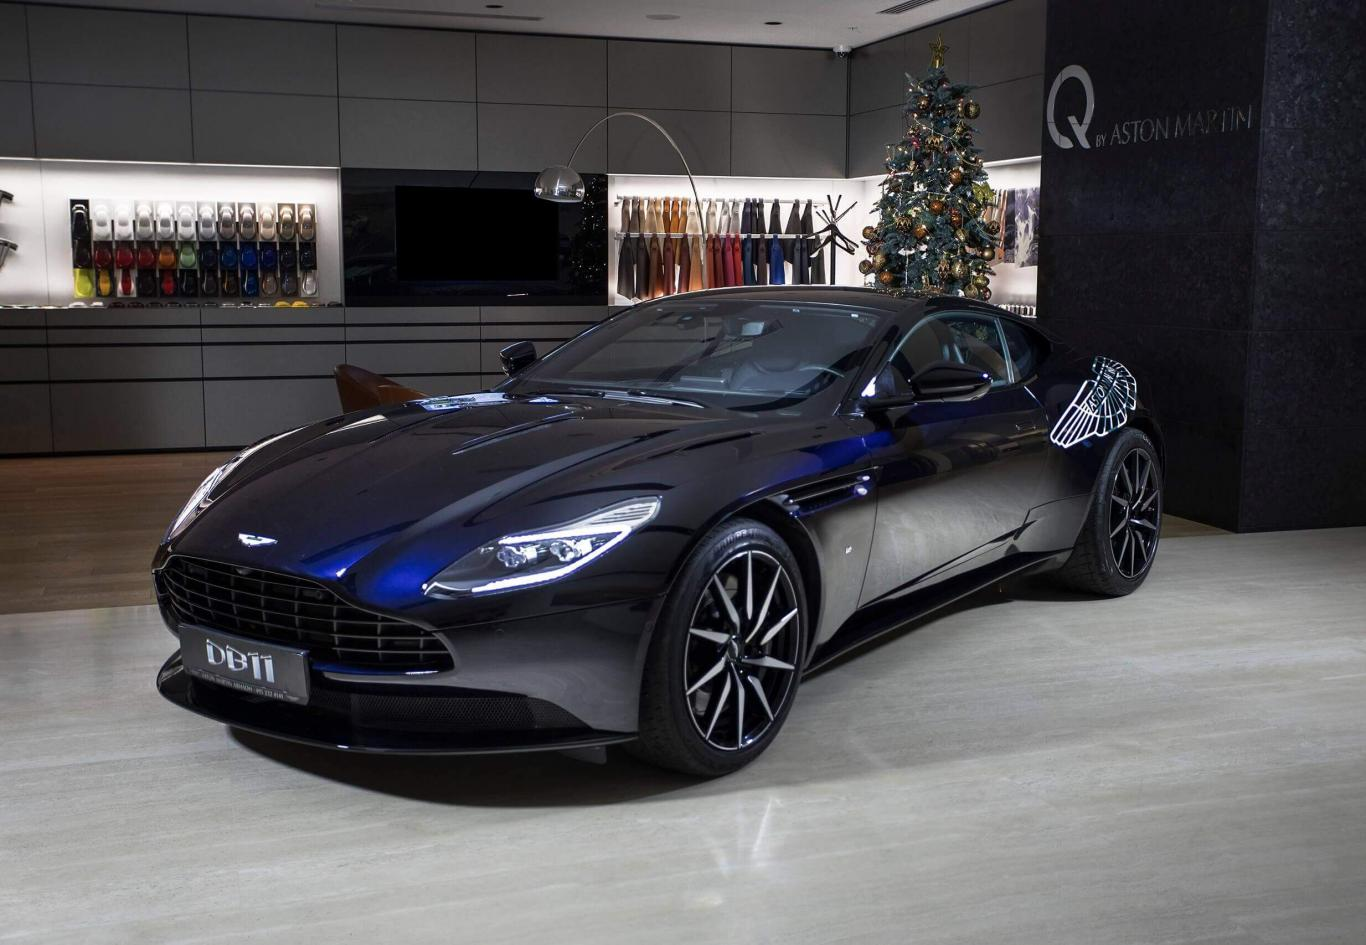 Black Aston Martin Wallpaper Download Free